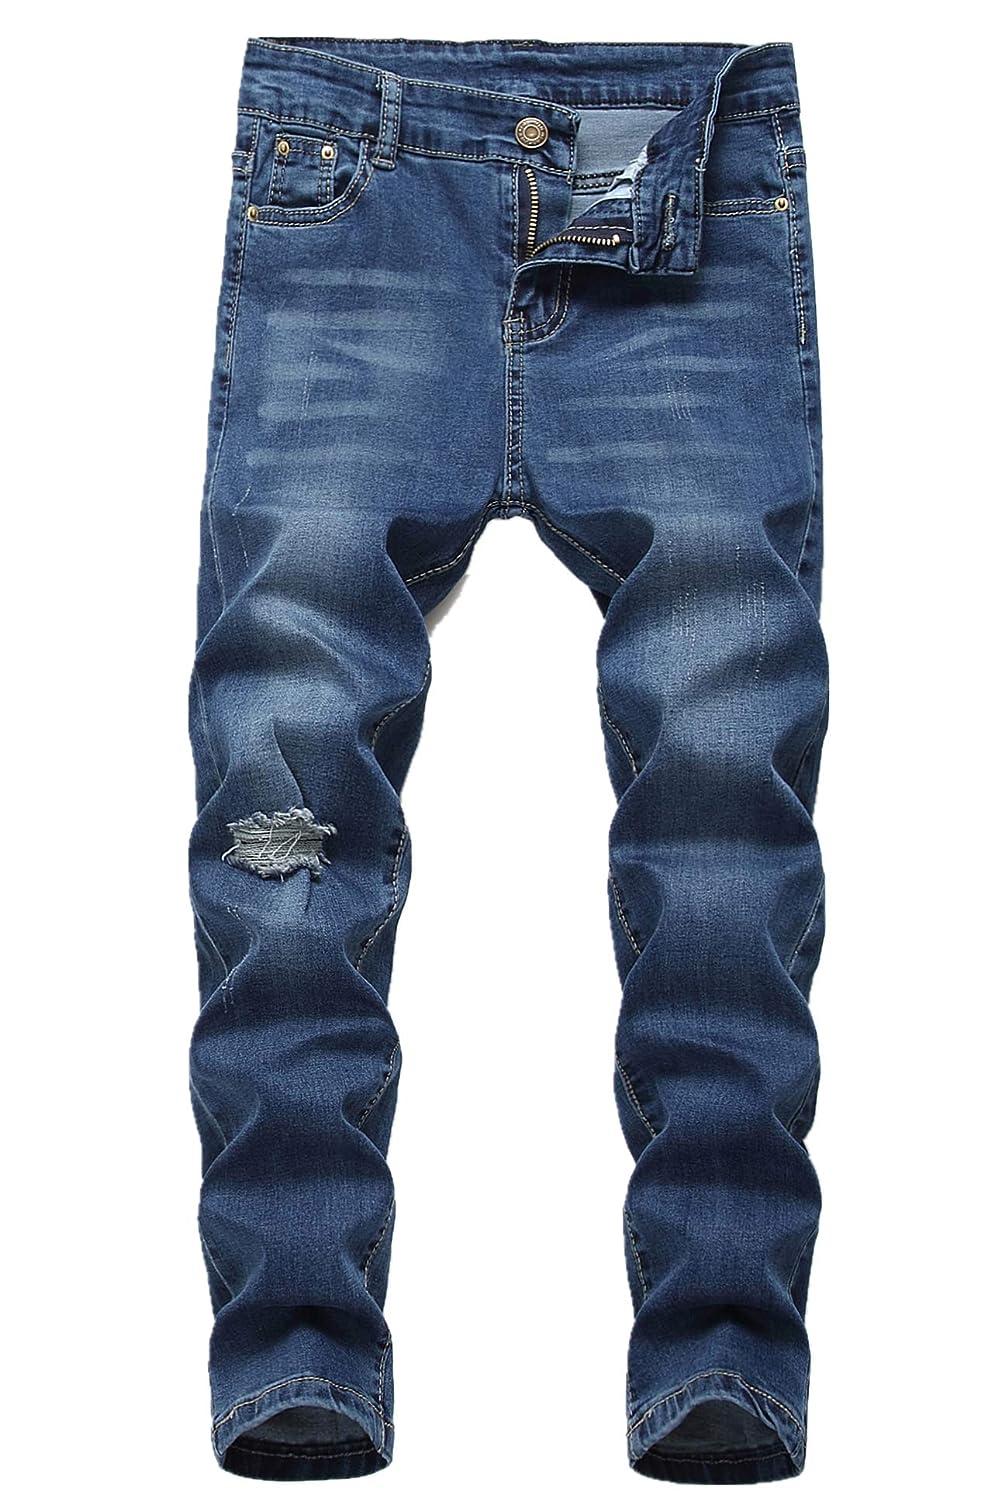 Boy's Jeans Kid's Slim Straight Fit Elastic Waist Stretch Fashion Pants(5 6 7 8 10 12 14 16)